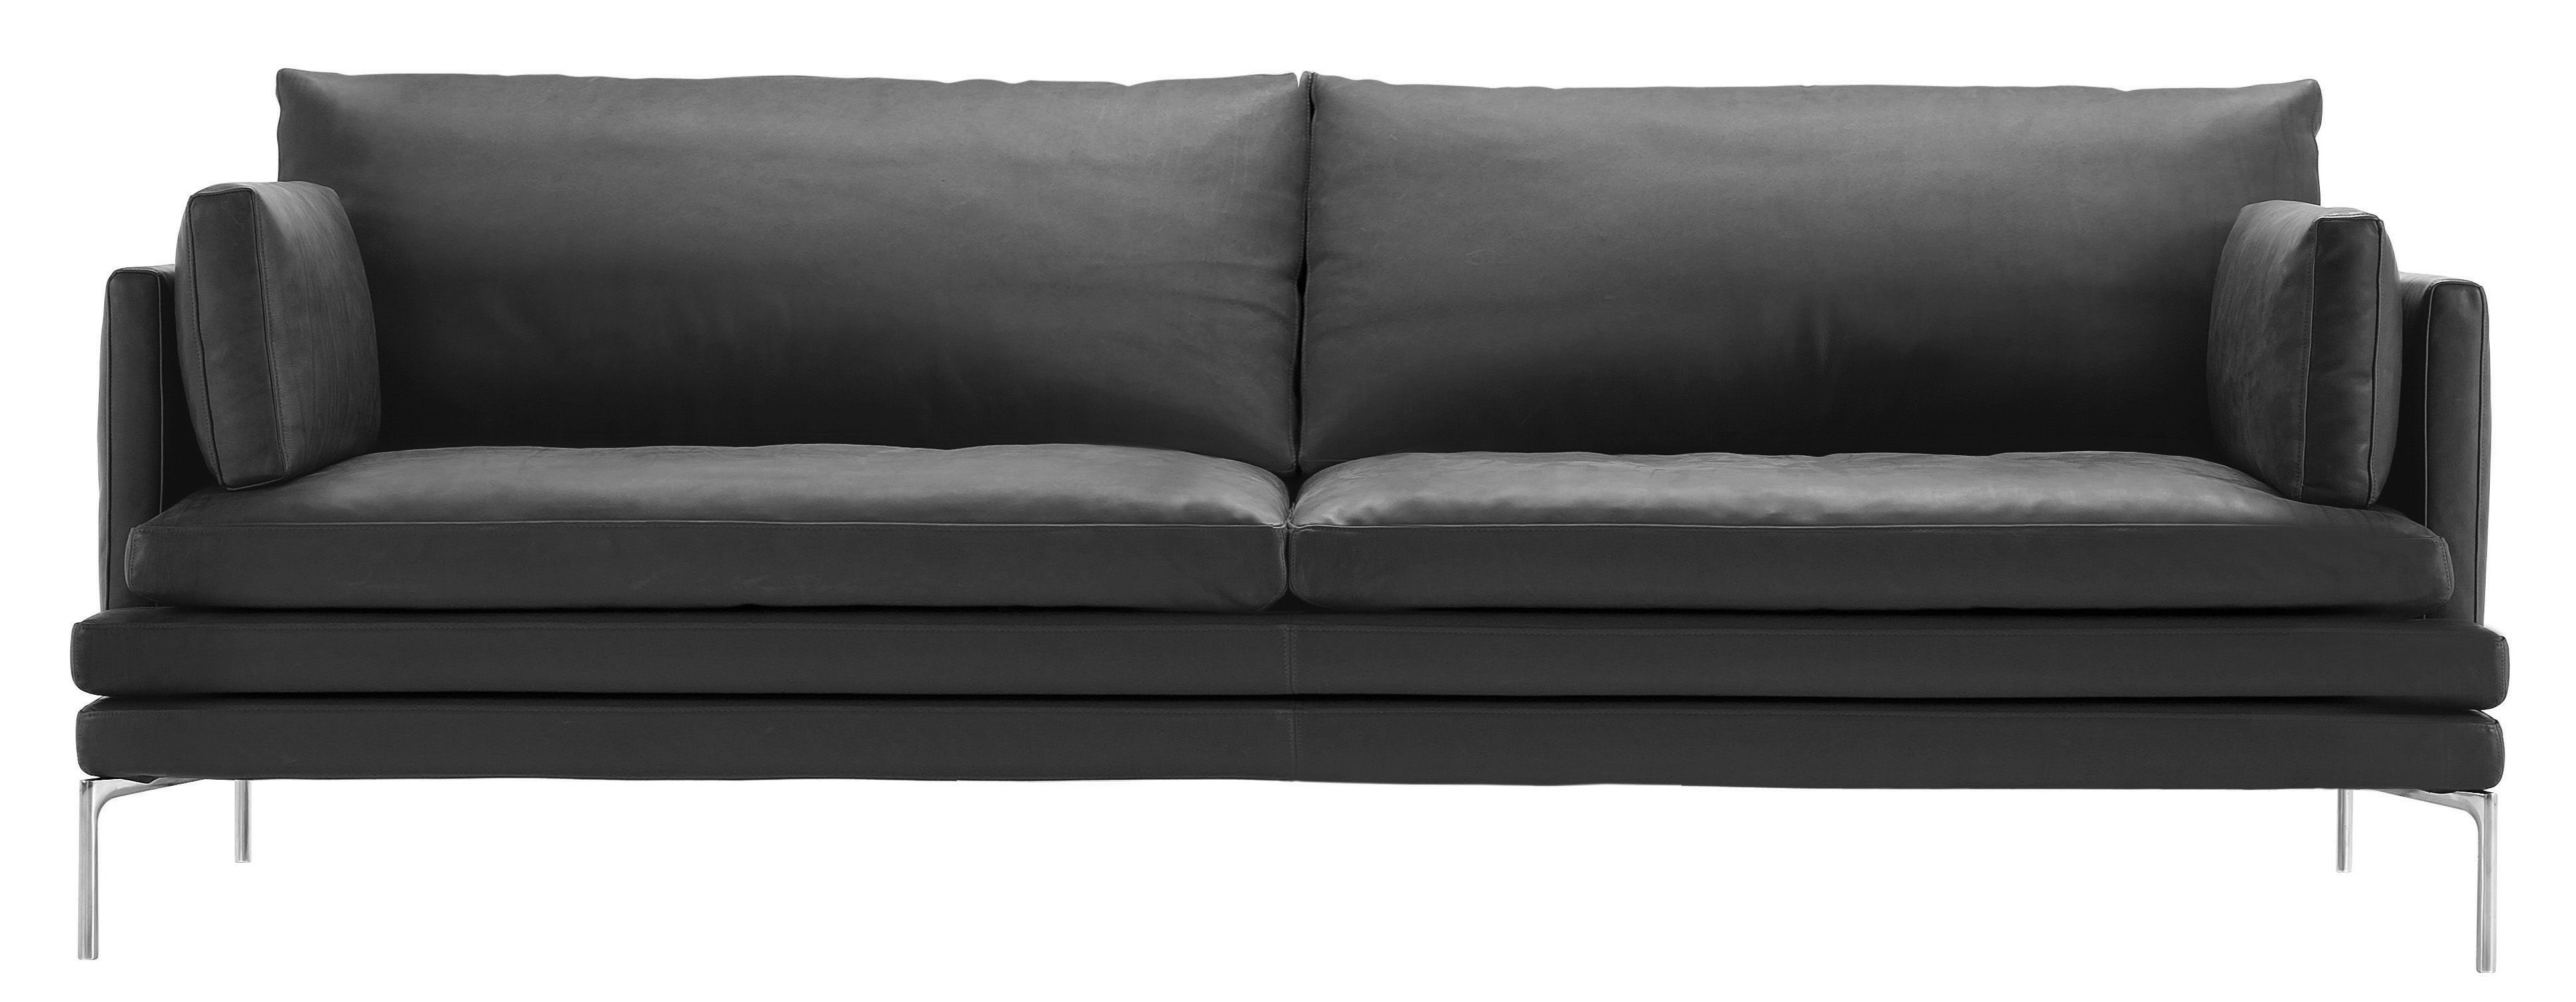 Möbel - Sofas - William Sofa / mit Stoffbezug - 2-Sitzer - L 224 cm - Zanotta - Stoffbezug - anthrazit-grau - Gewebe, poliertes Aluminium